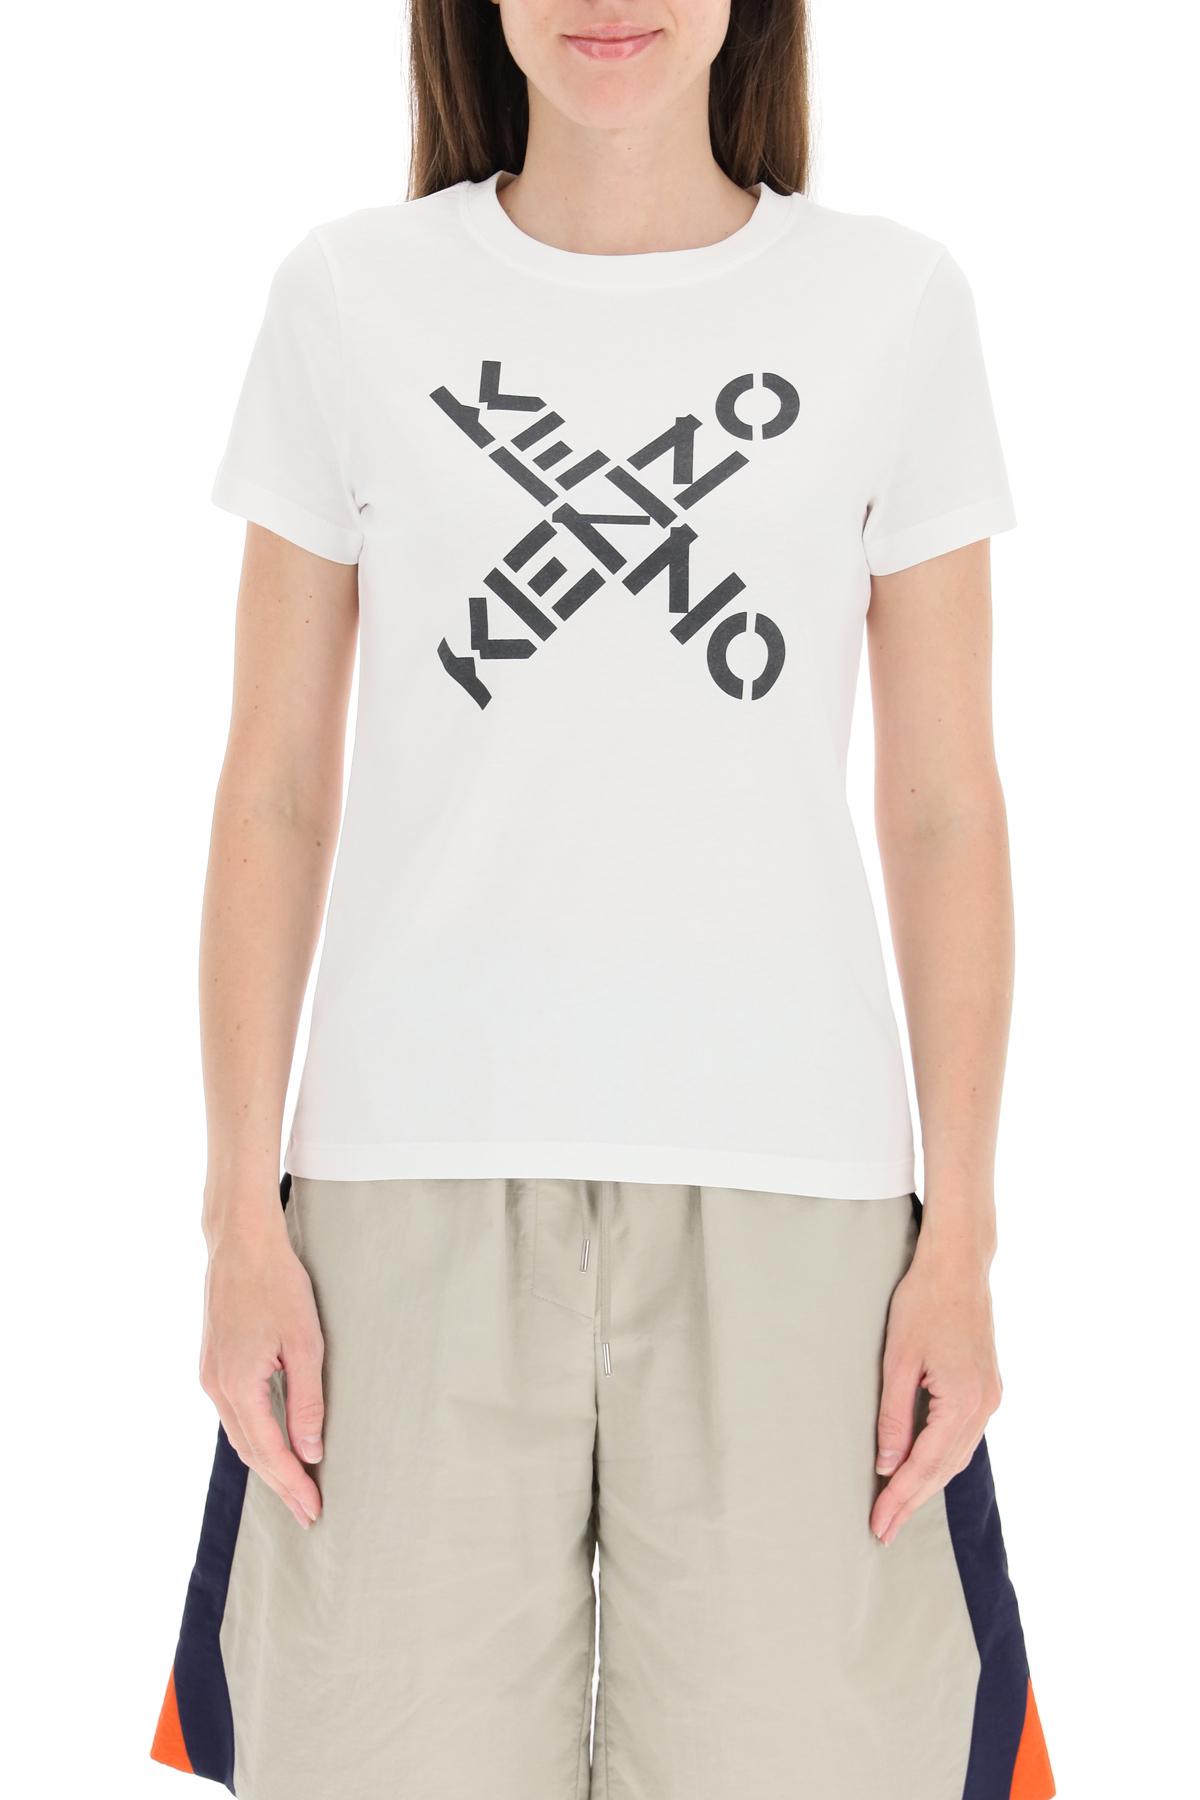 Kenzo t-shirt kenzo sport big x